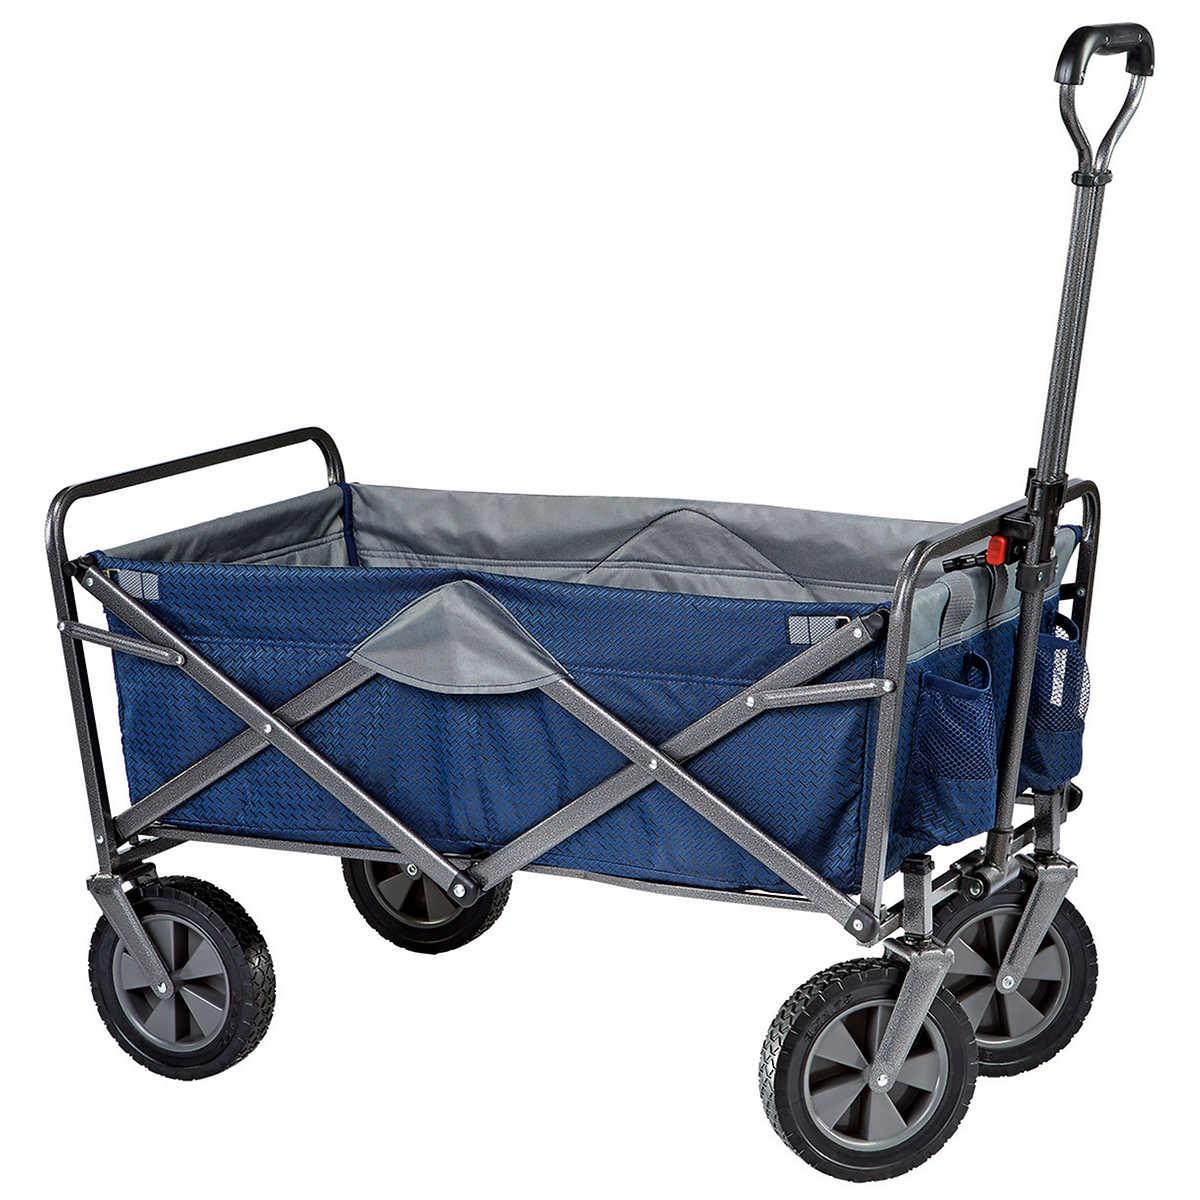 2521d702358c Mac Sports Folding Utility Wagon